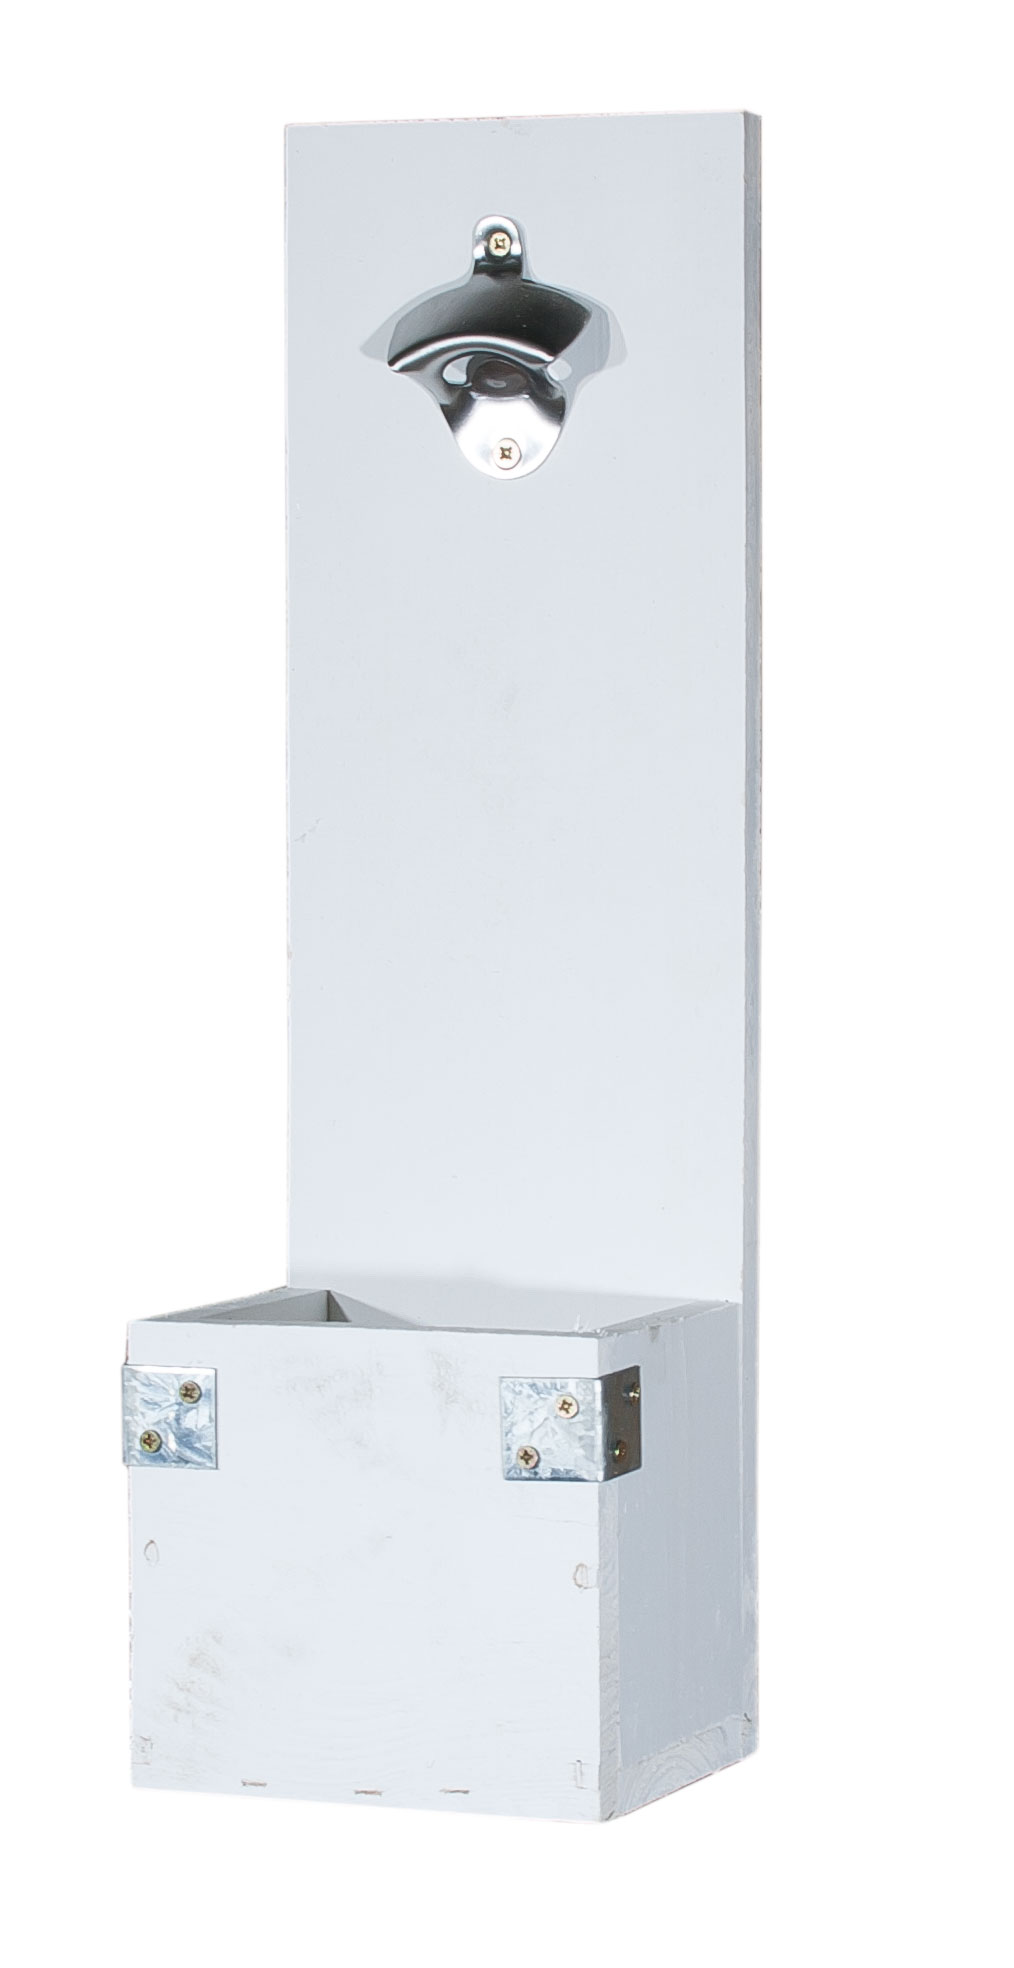 Wand-Flaschenöffner - Shabby Chic Optik 50x15x13cm